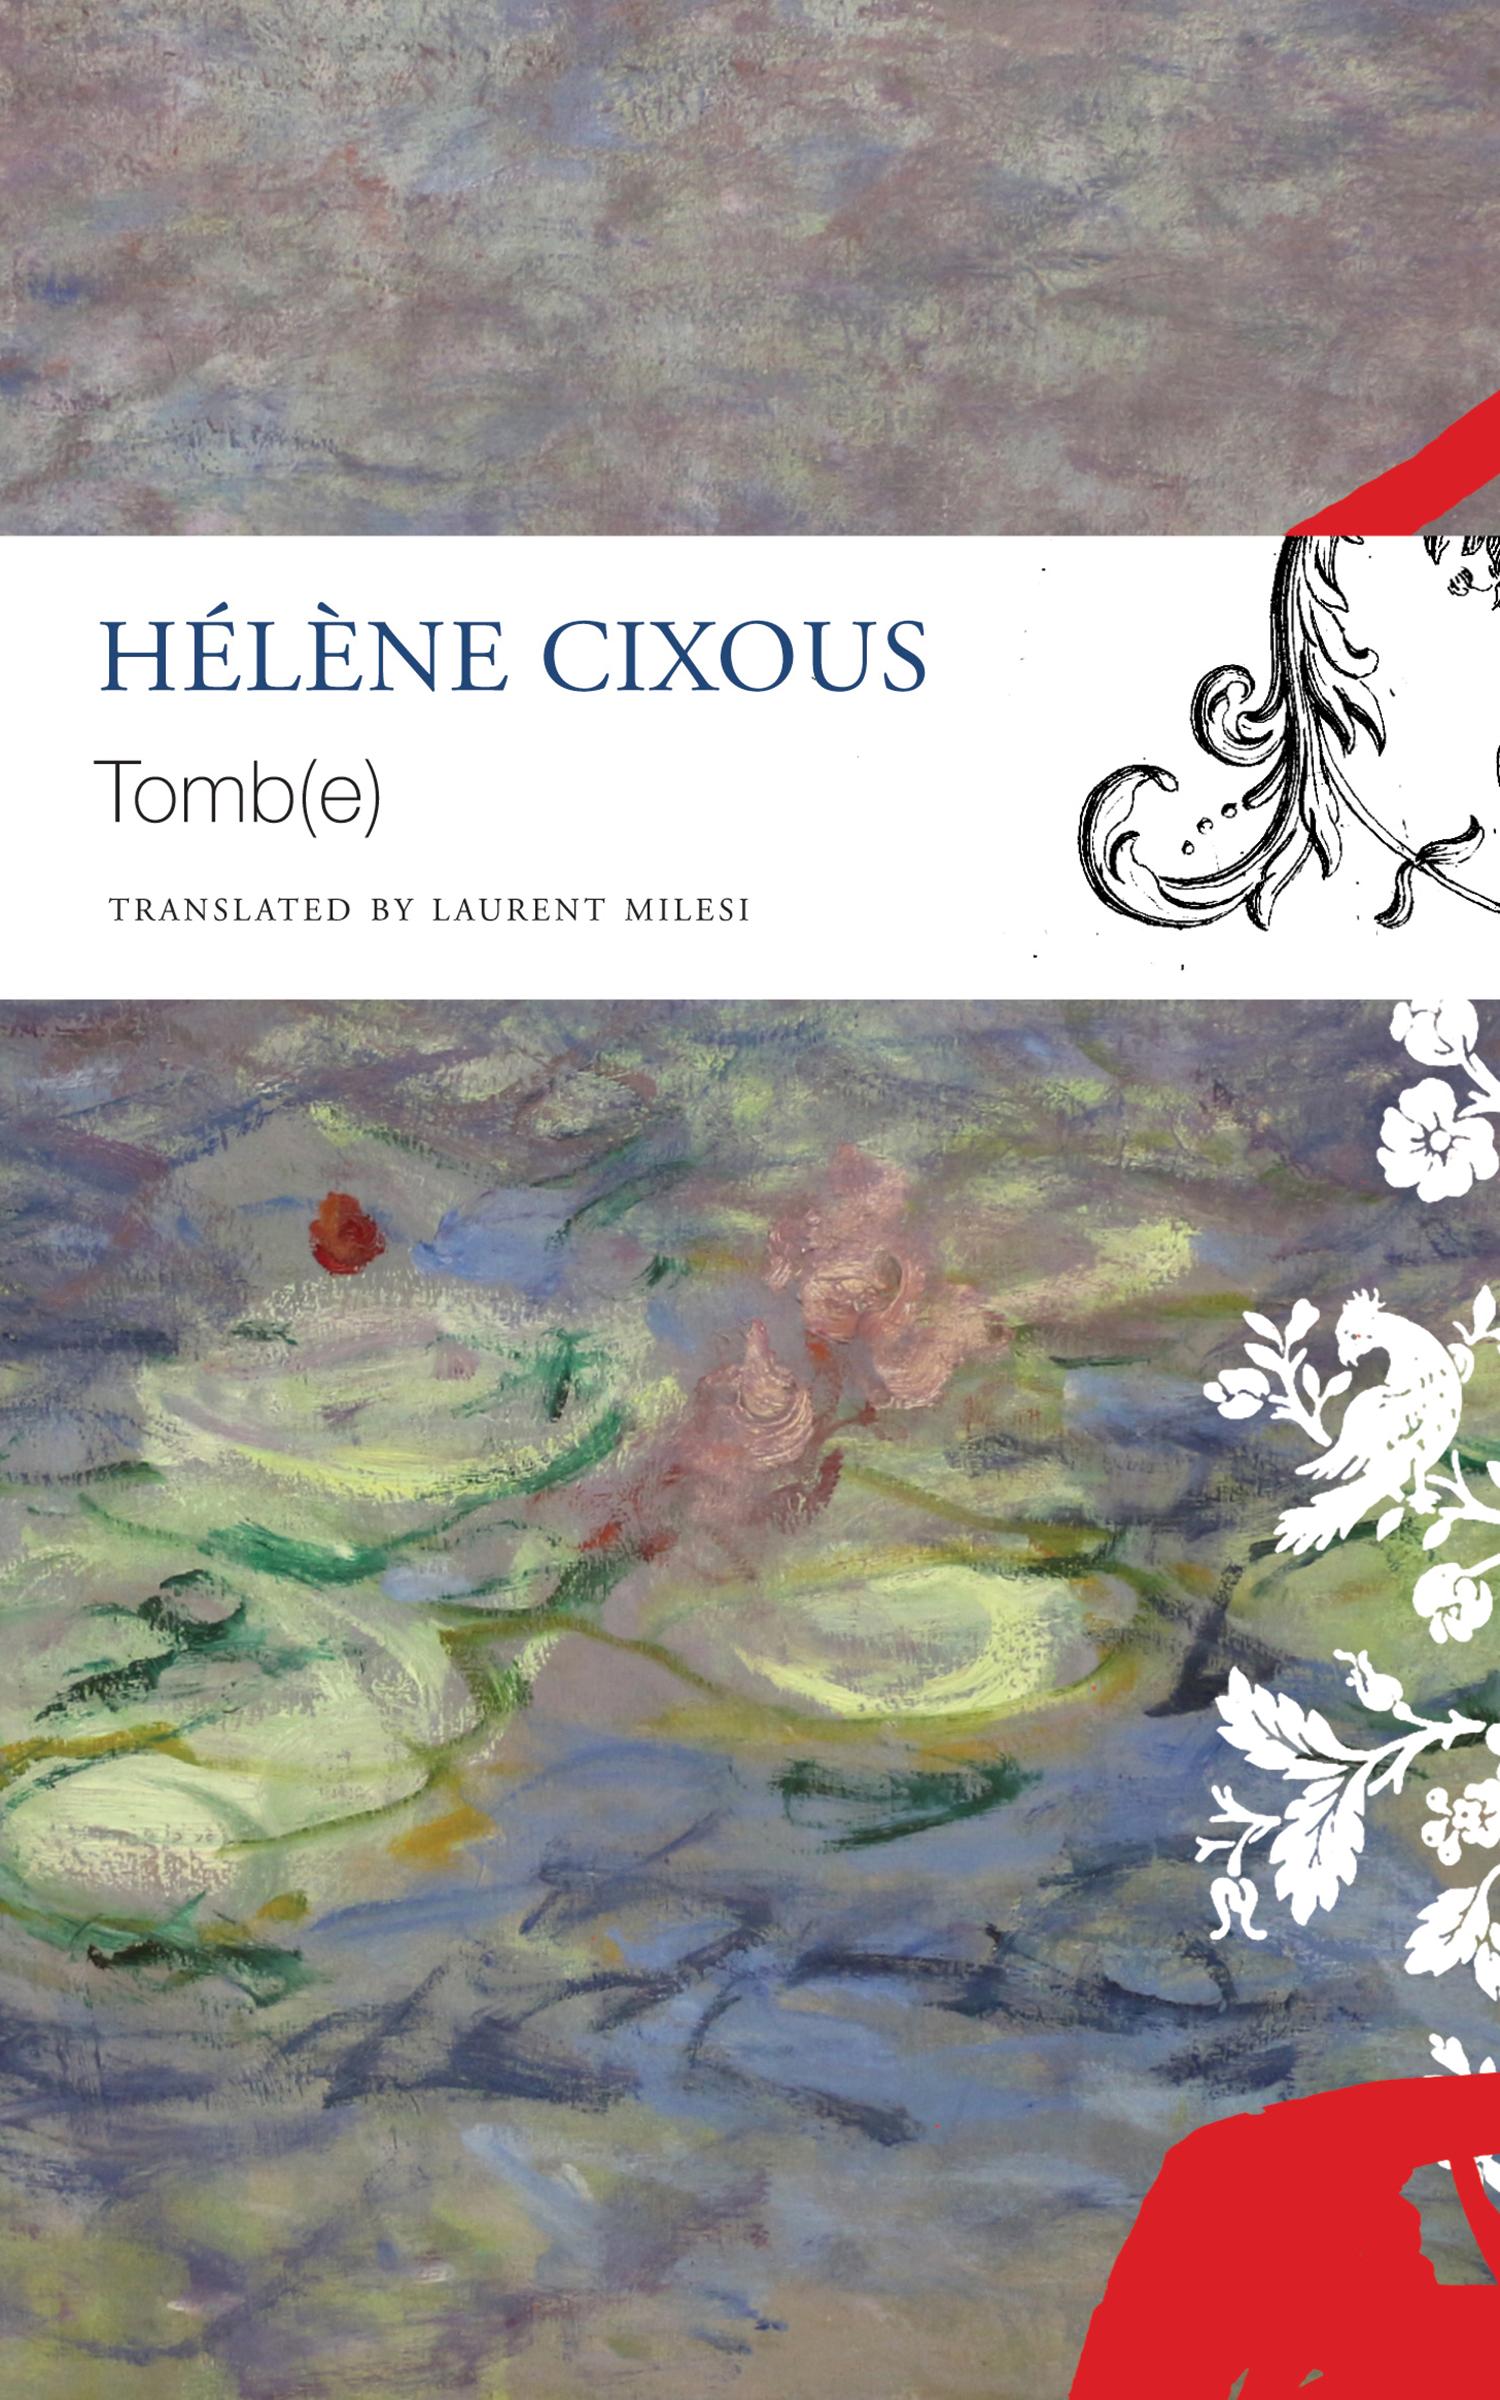 Tomb(e) by Hélène Cixous   Seagull Books